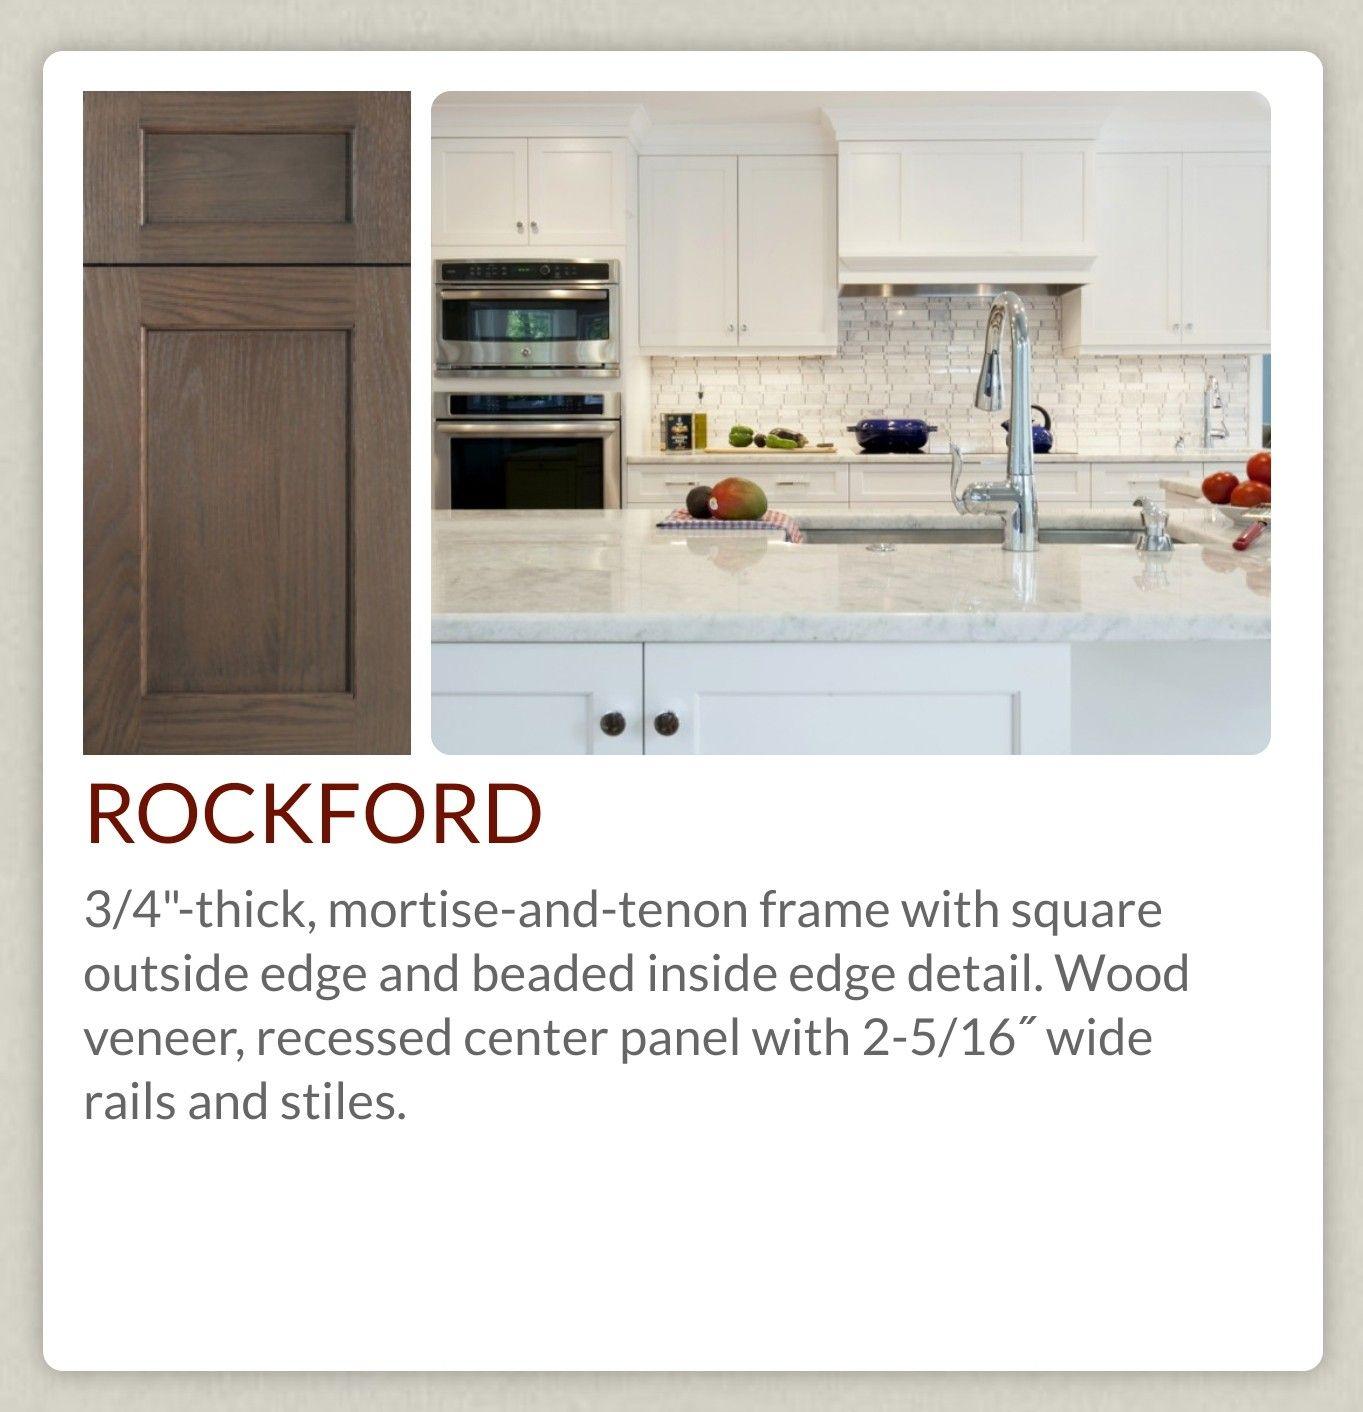 UltraCraft Rockford Kitchen, Mortise, tenon, Wood veneer